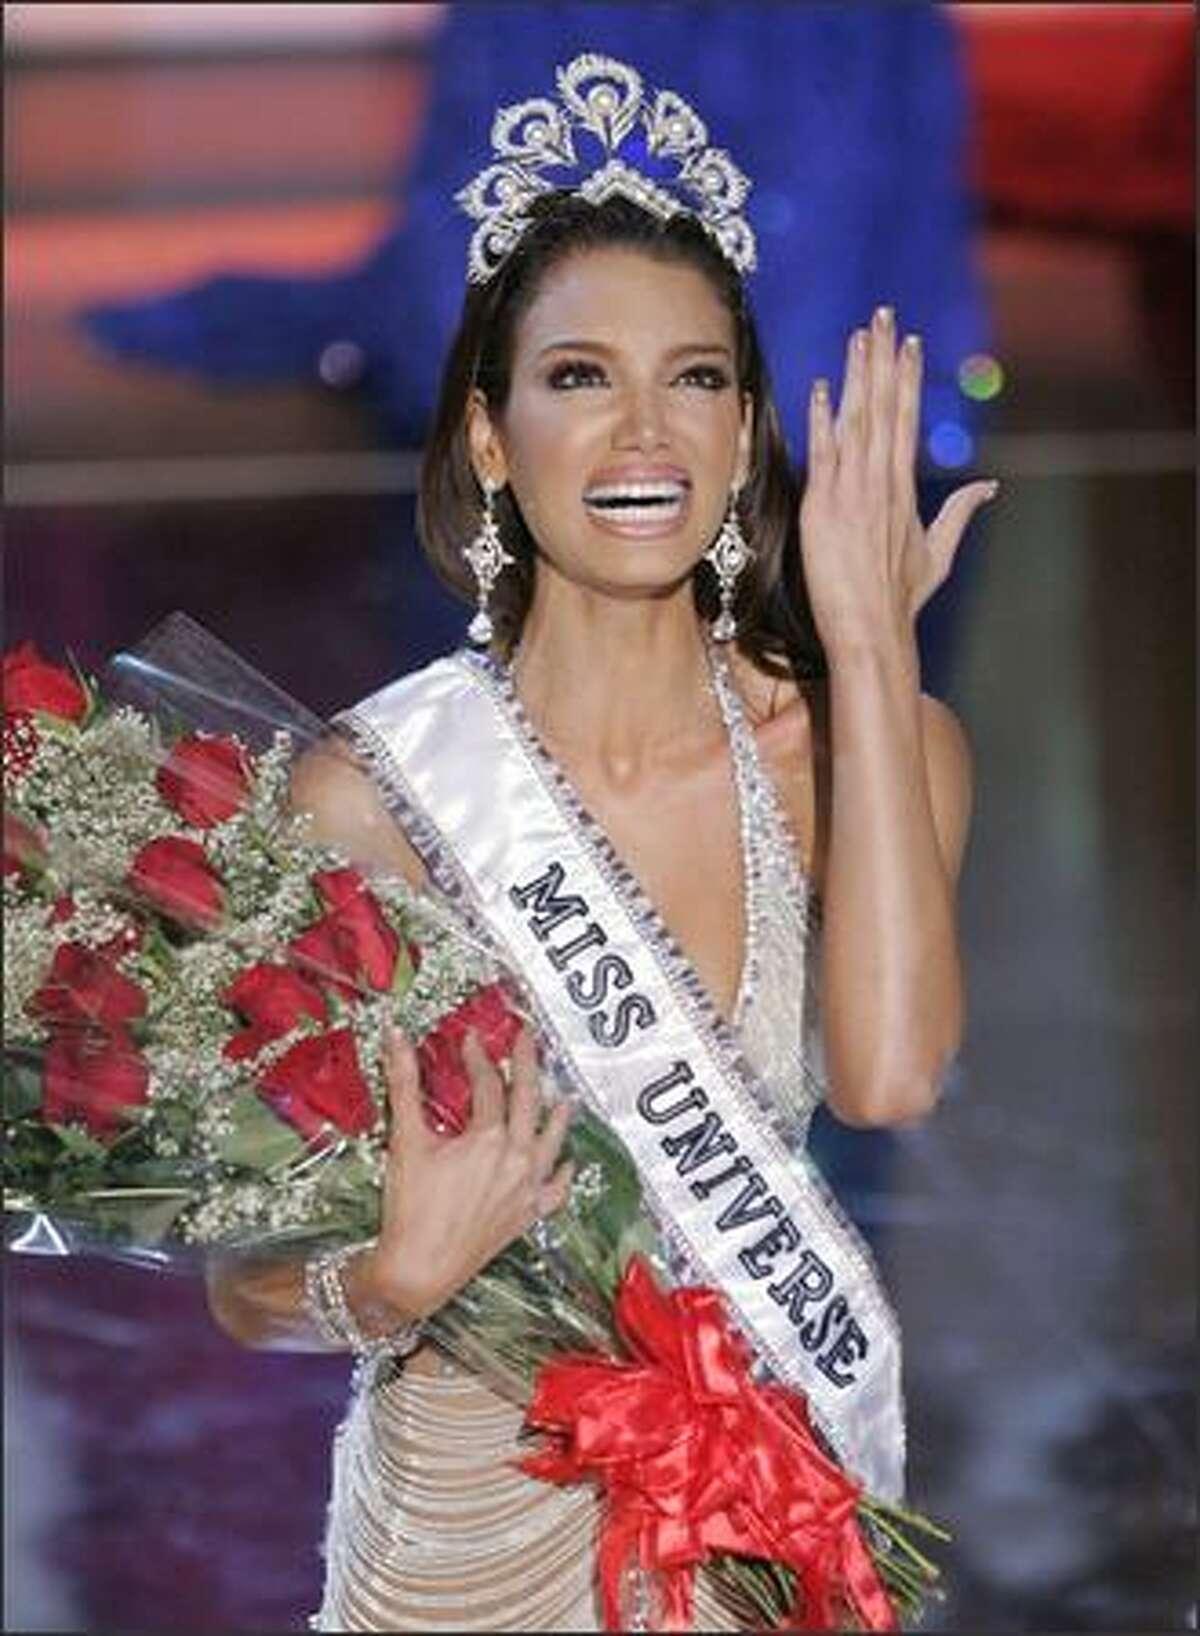 Zuleyka Rivera Mendoza, Miss Puerto Rico, reacts after being crowned Miss Universe 2006. (AP Photo/Mark J. Terrill)